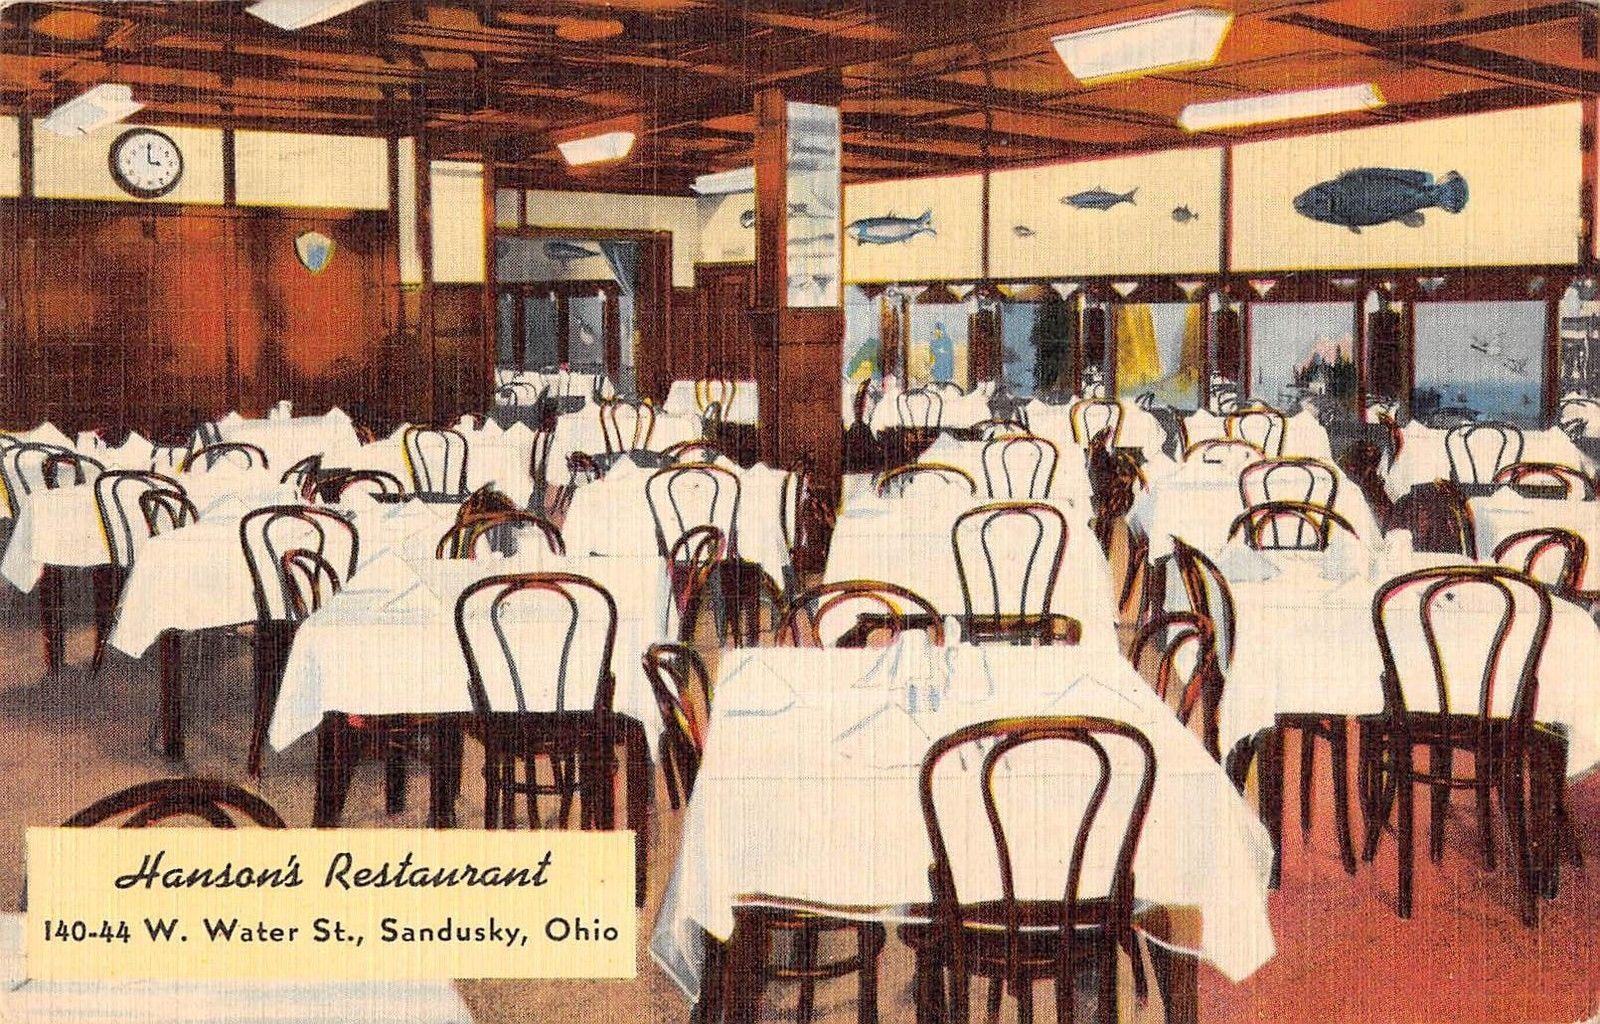 Hansons Restaurant Sandusky Ohio Antique Postcard T3512 Mary L